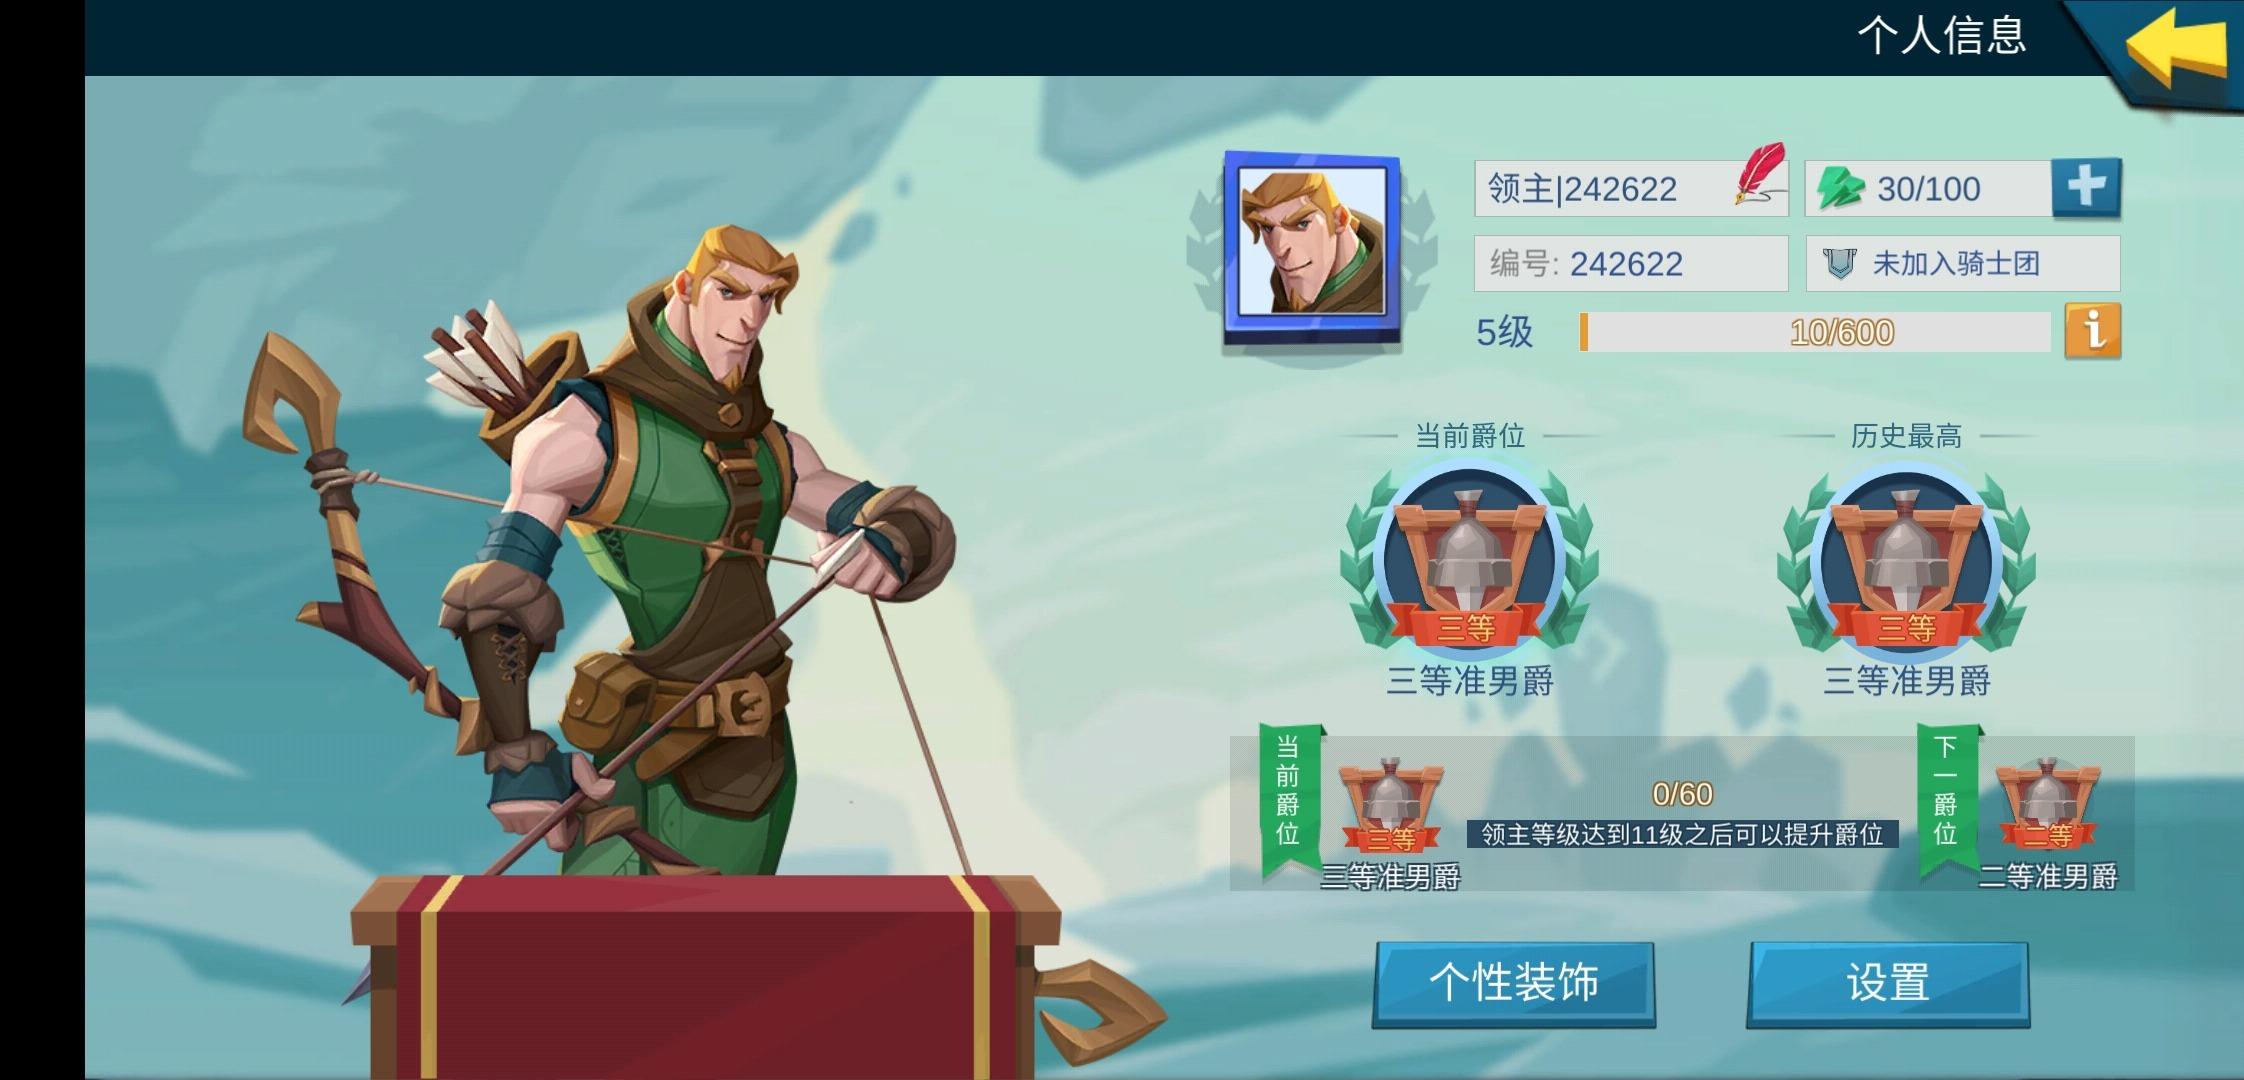 Screenshot_2021-06-04-18-41-27-457_com.jedigames.p21.guanwang.jpg